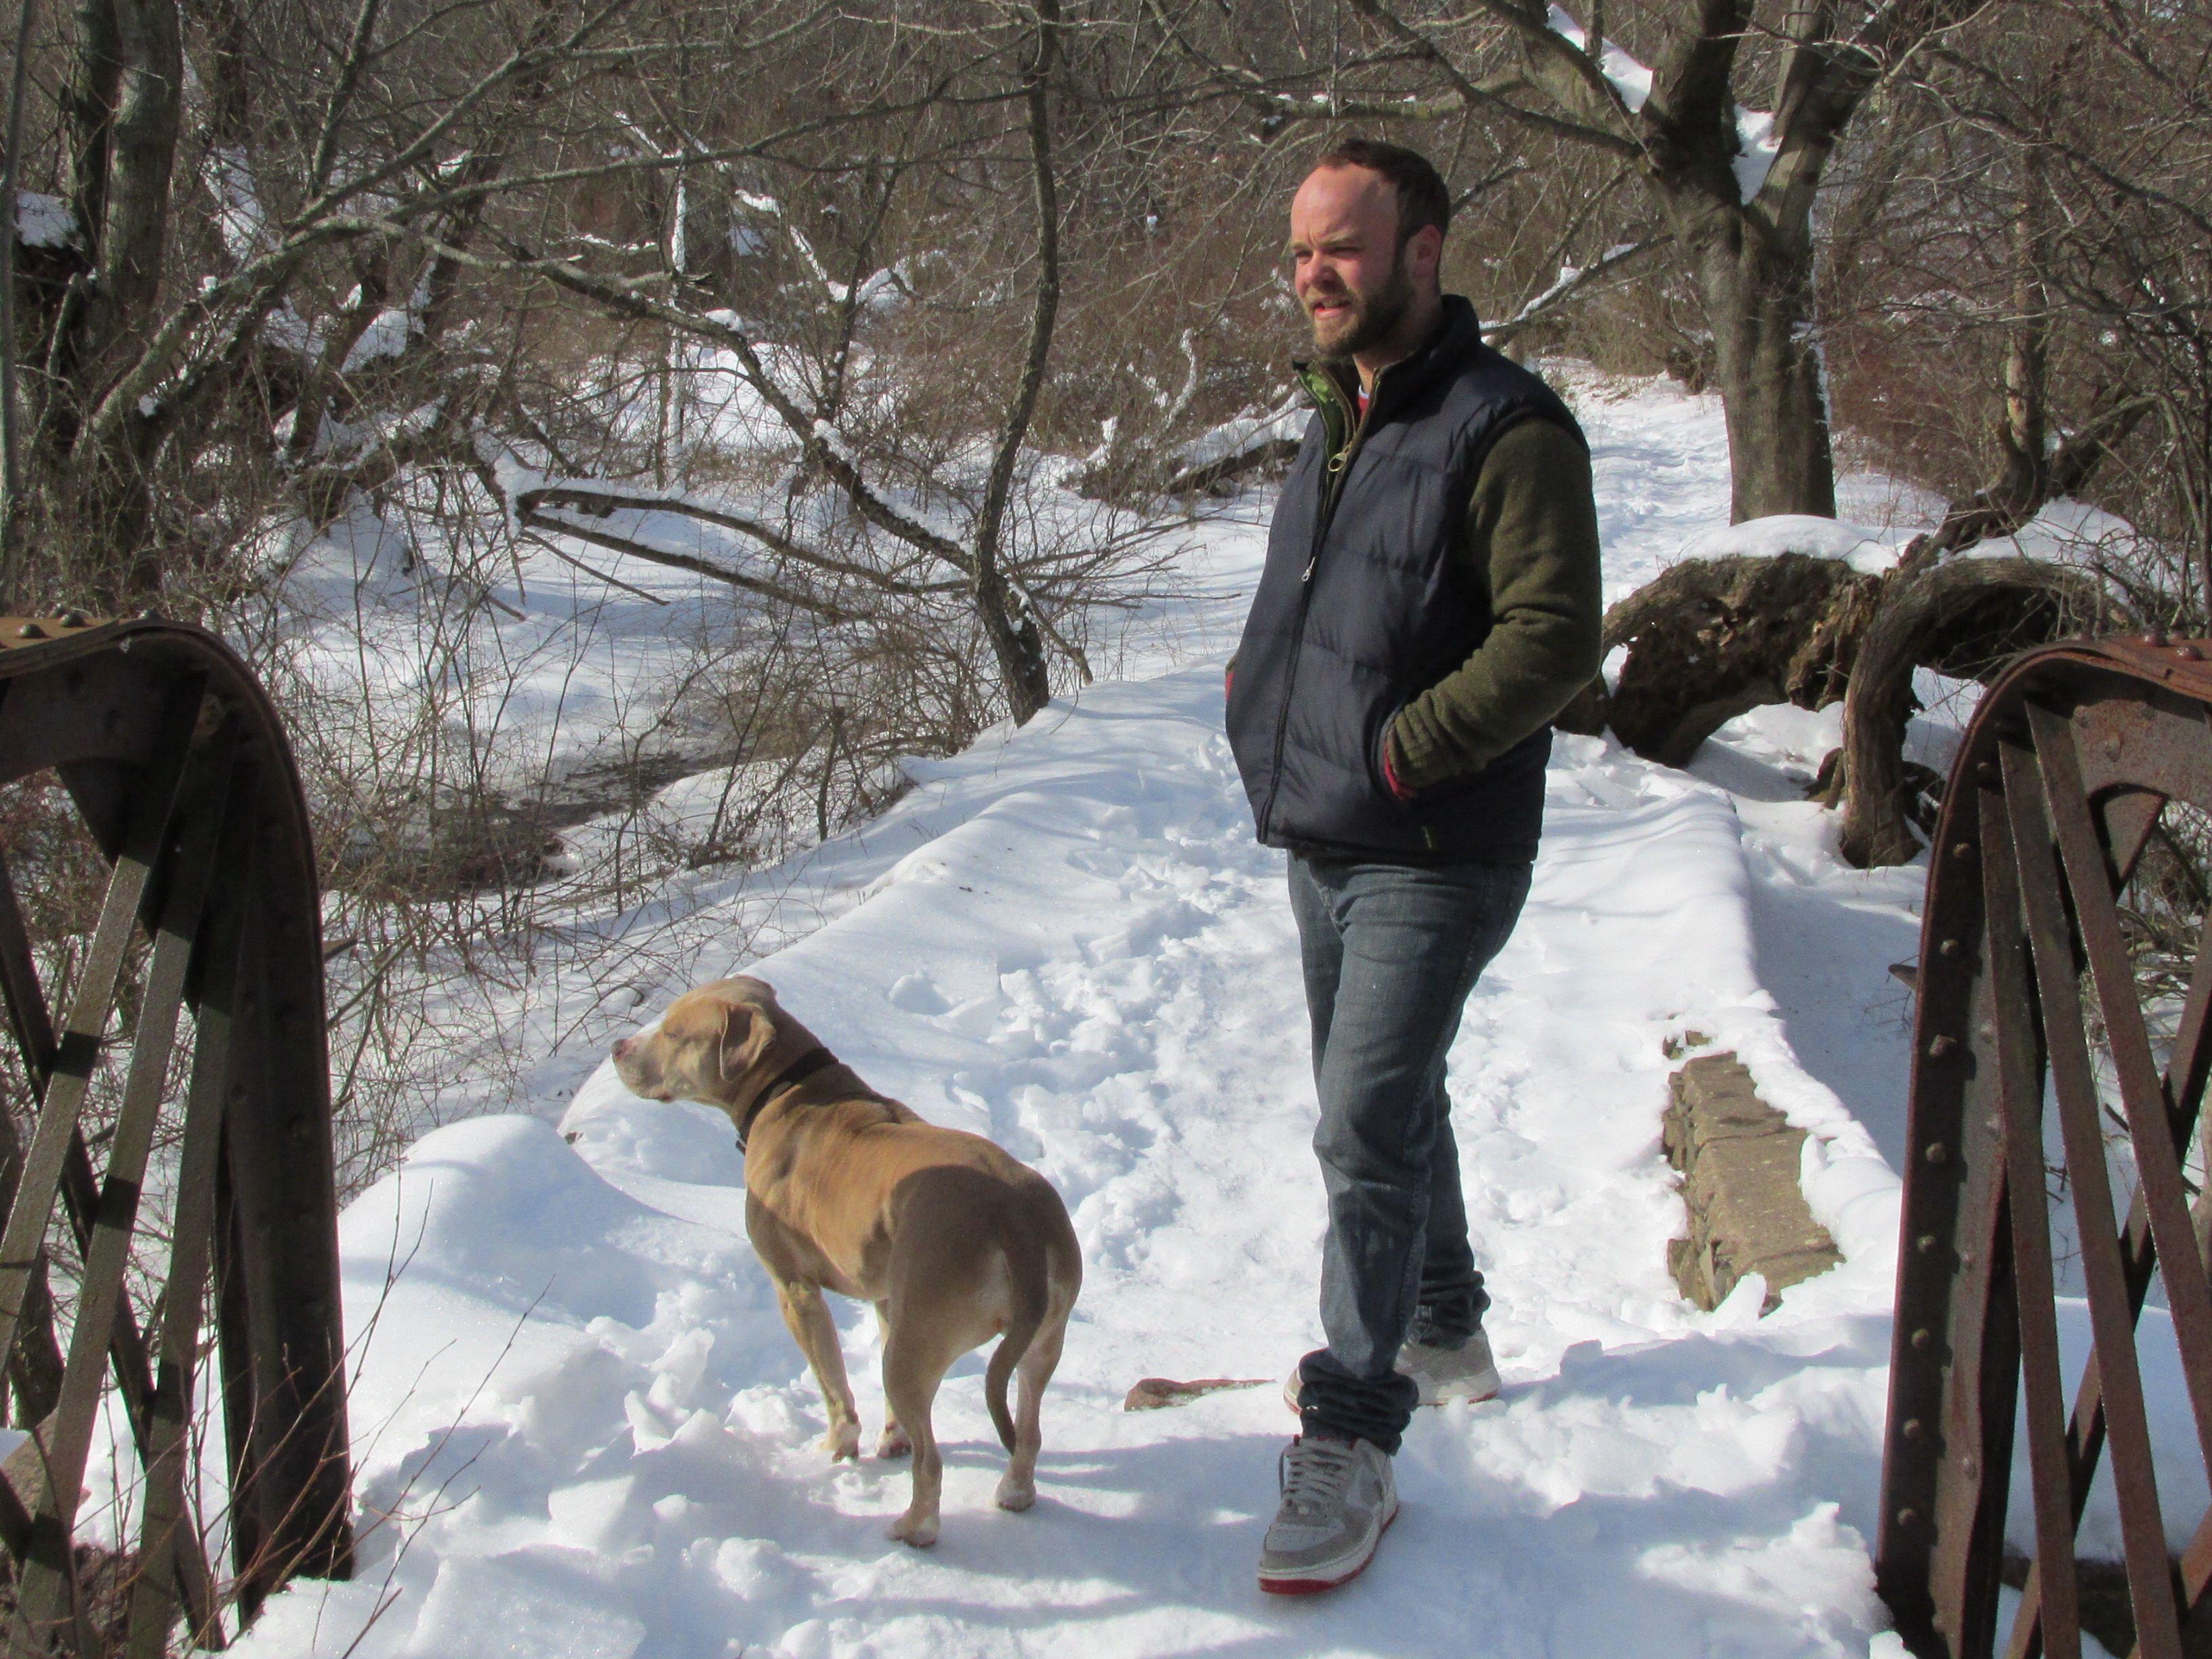 Mill River Trailers, Whitney Avenue, Hamden, CT. Dog cat